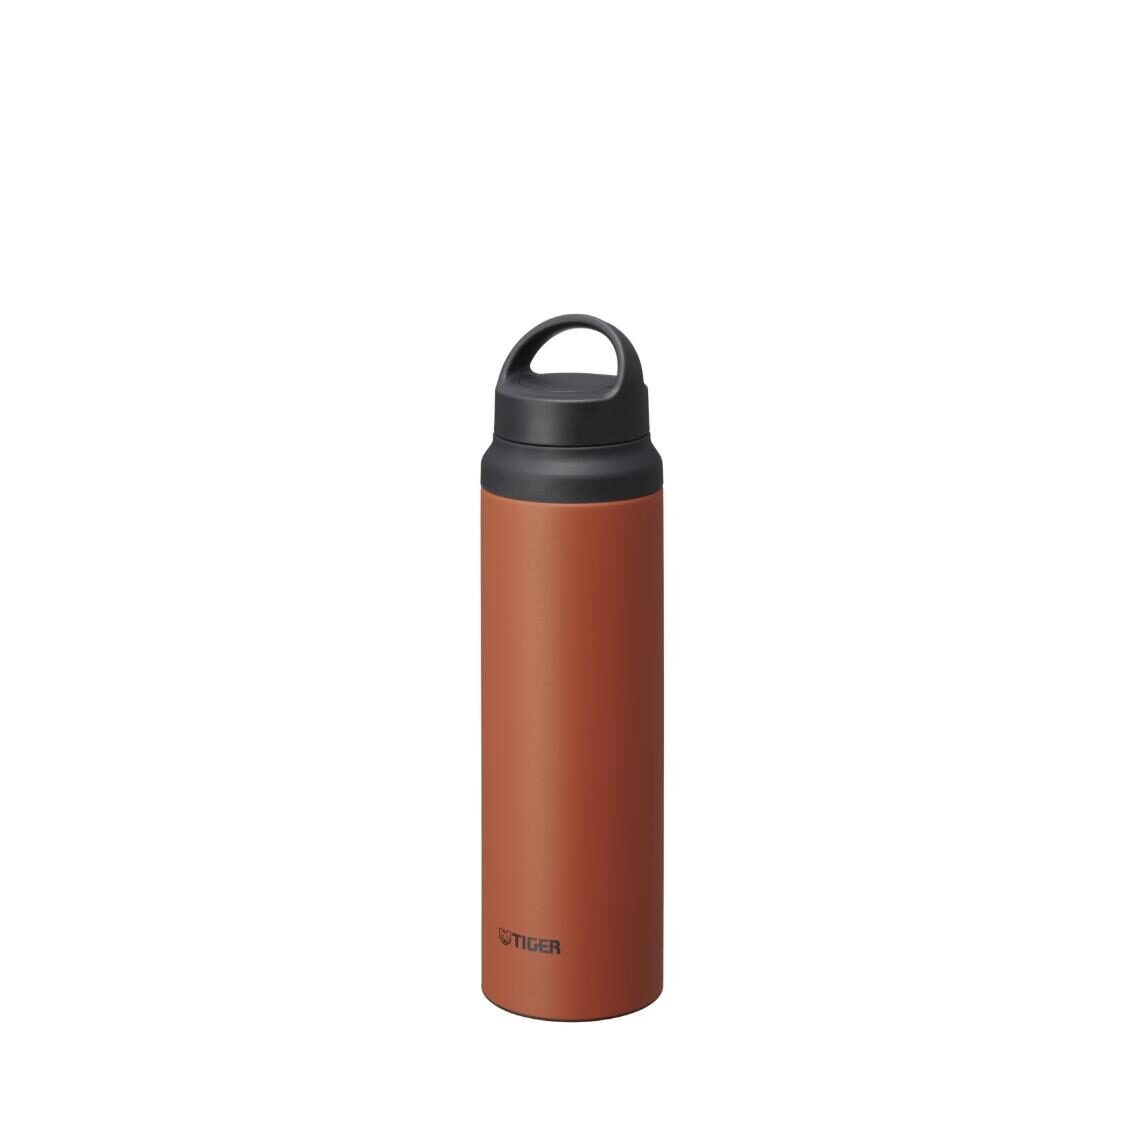 Tiger 800ml Double Stainless Steel Bottle - Uluru Mcz-S080 Te